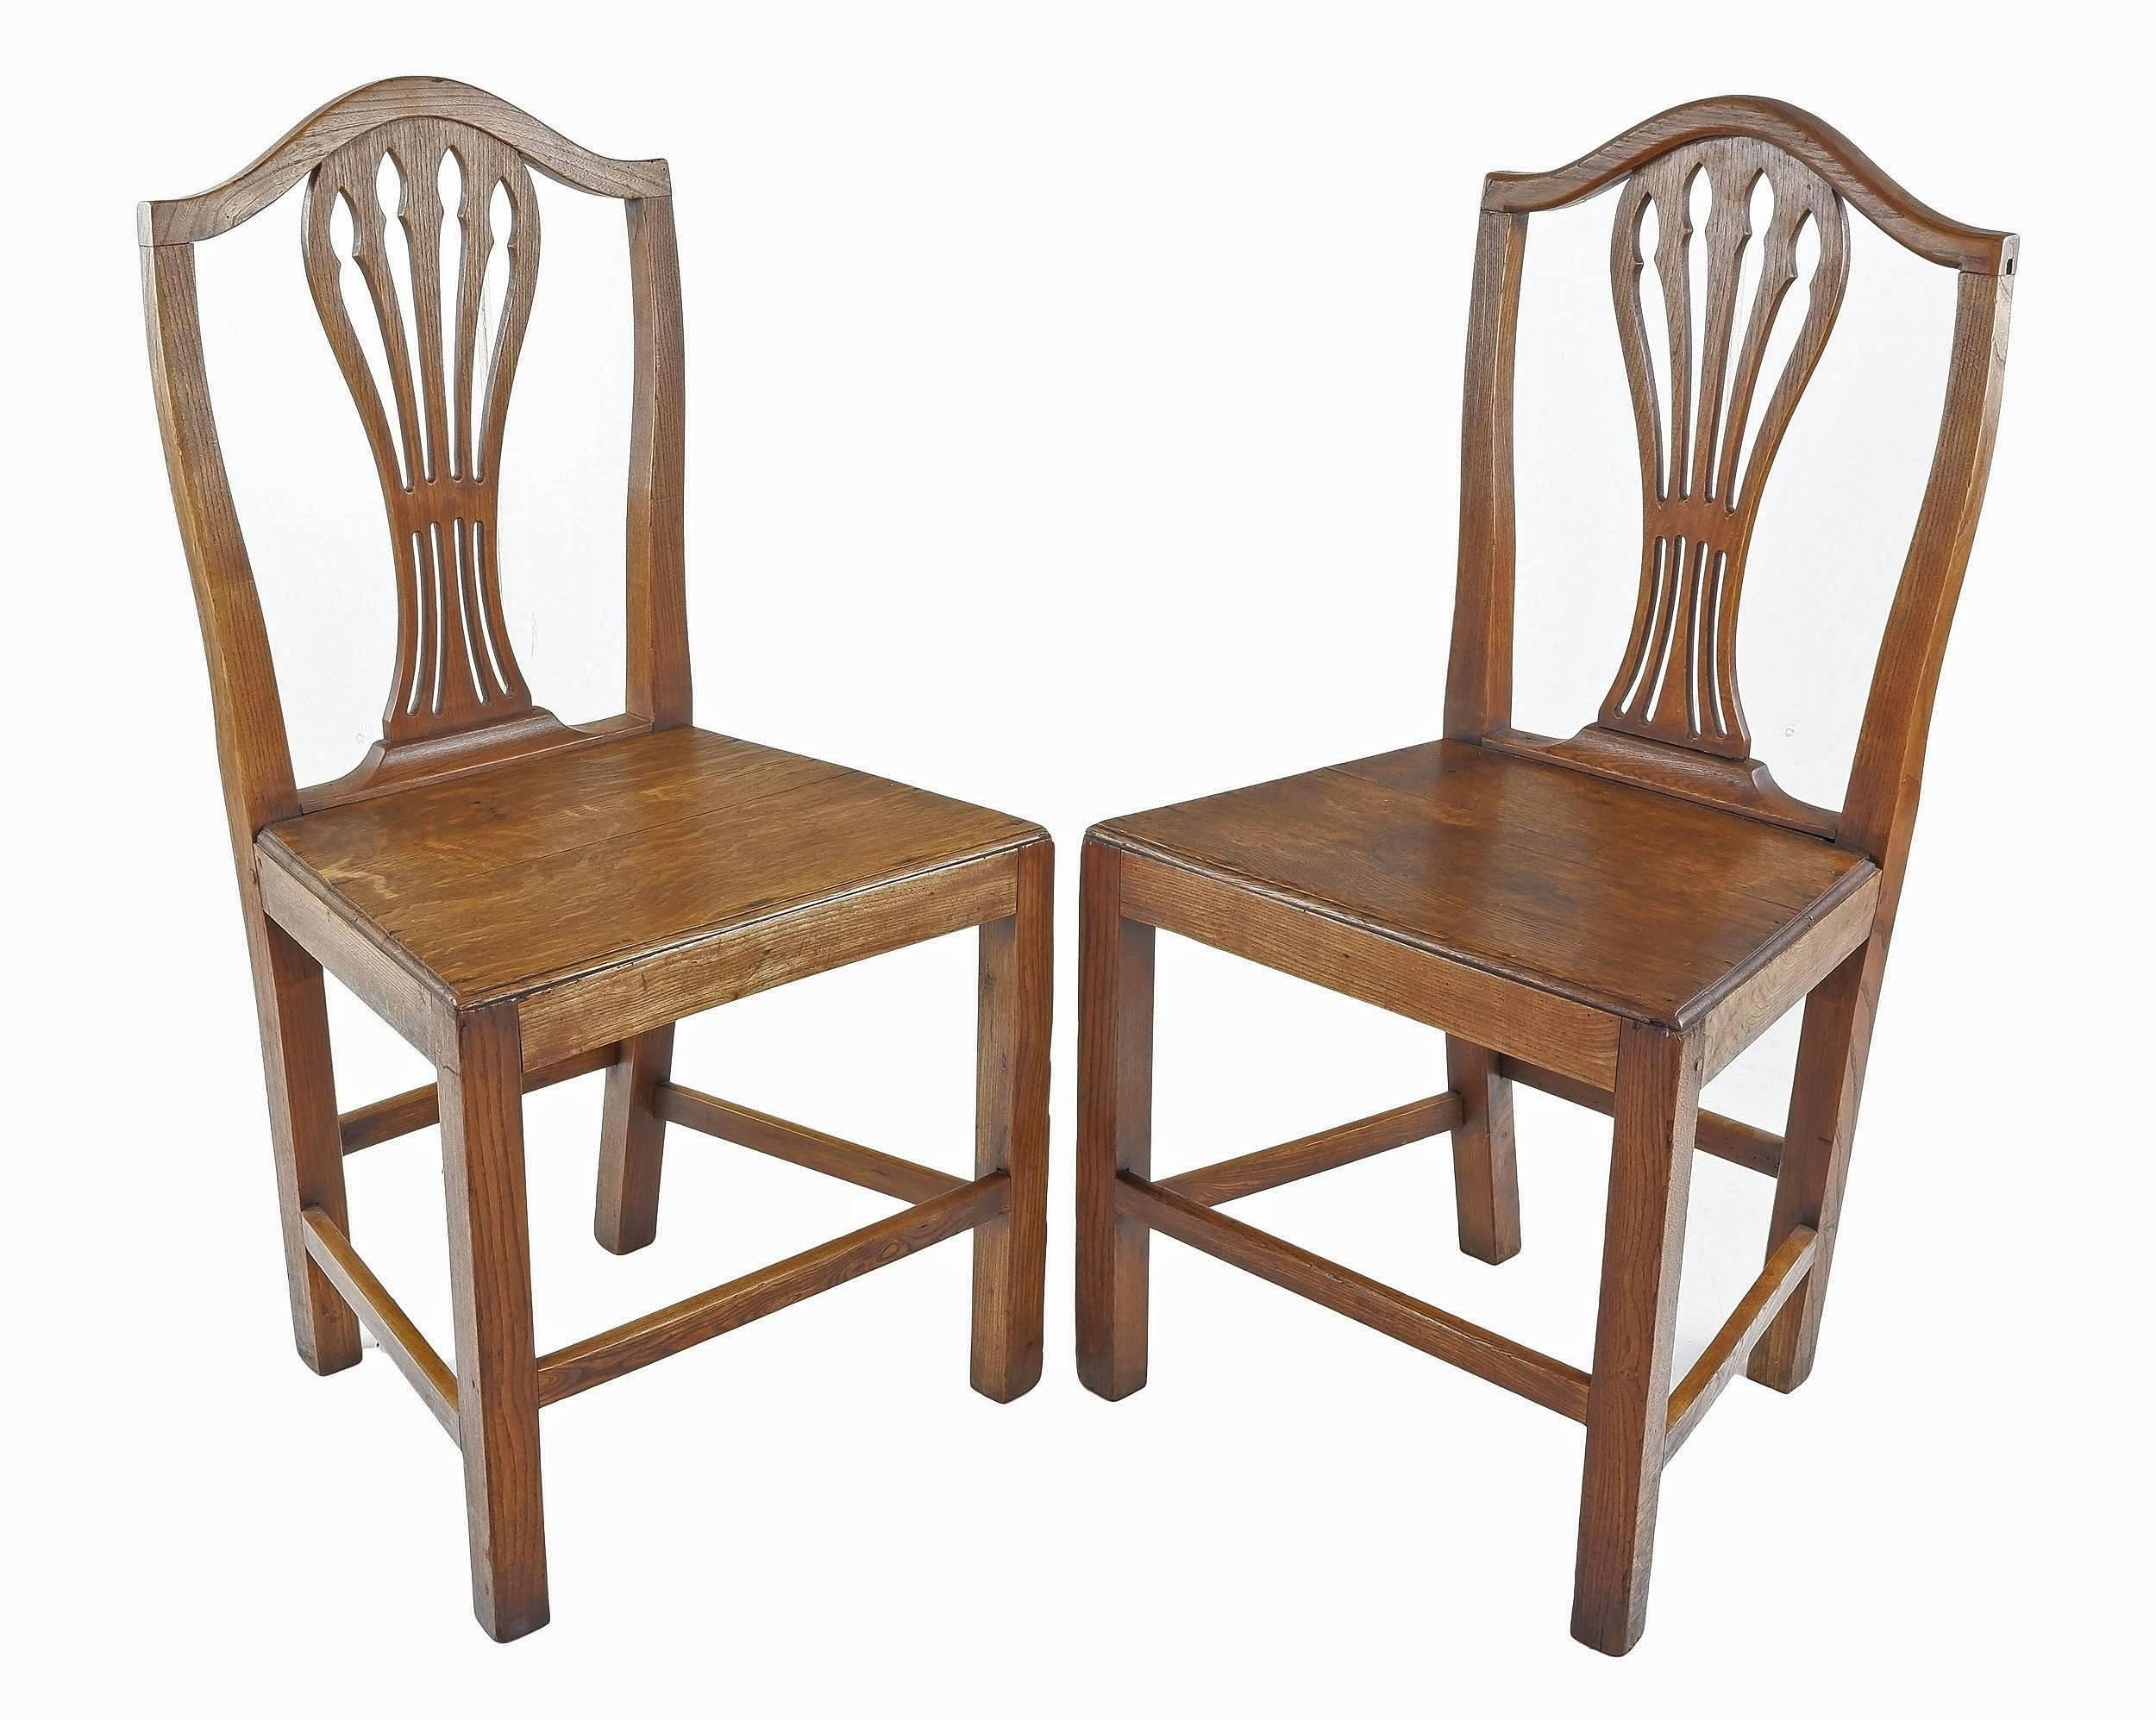 'Pair Georgian Country English Elm Chairs, Circa 1800'